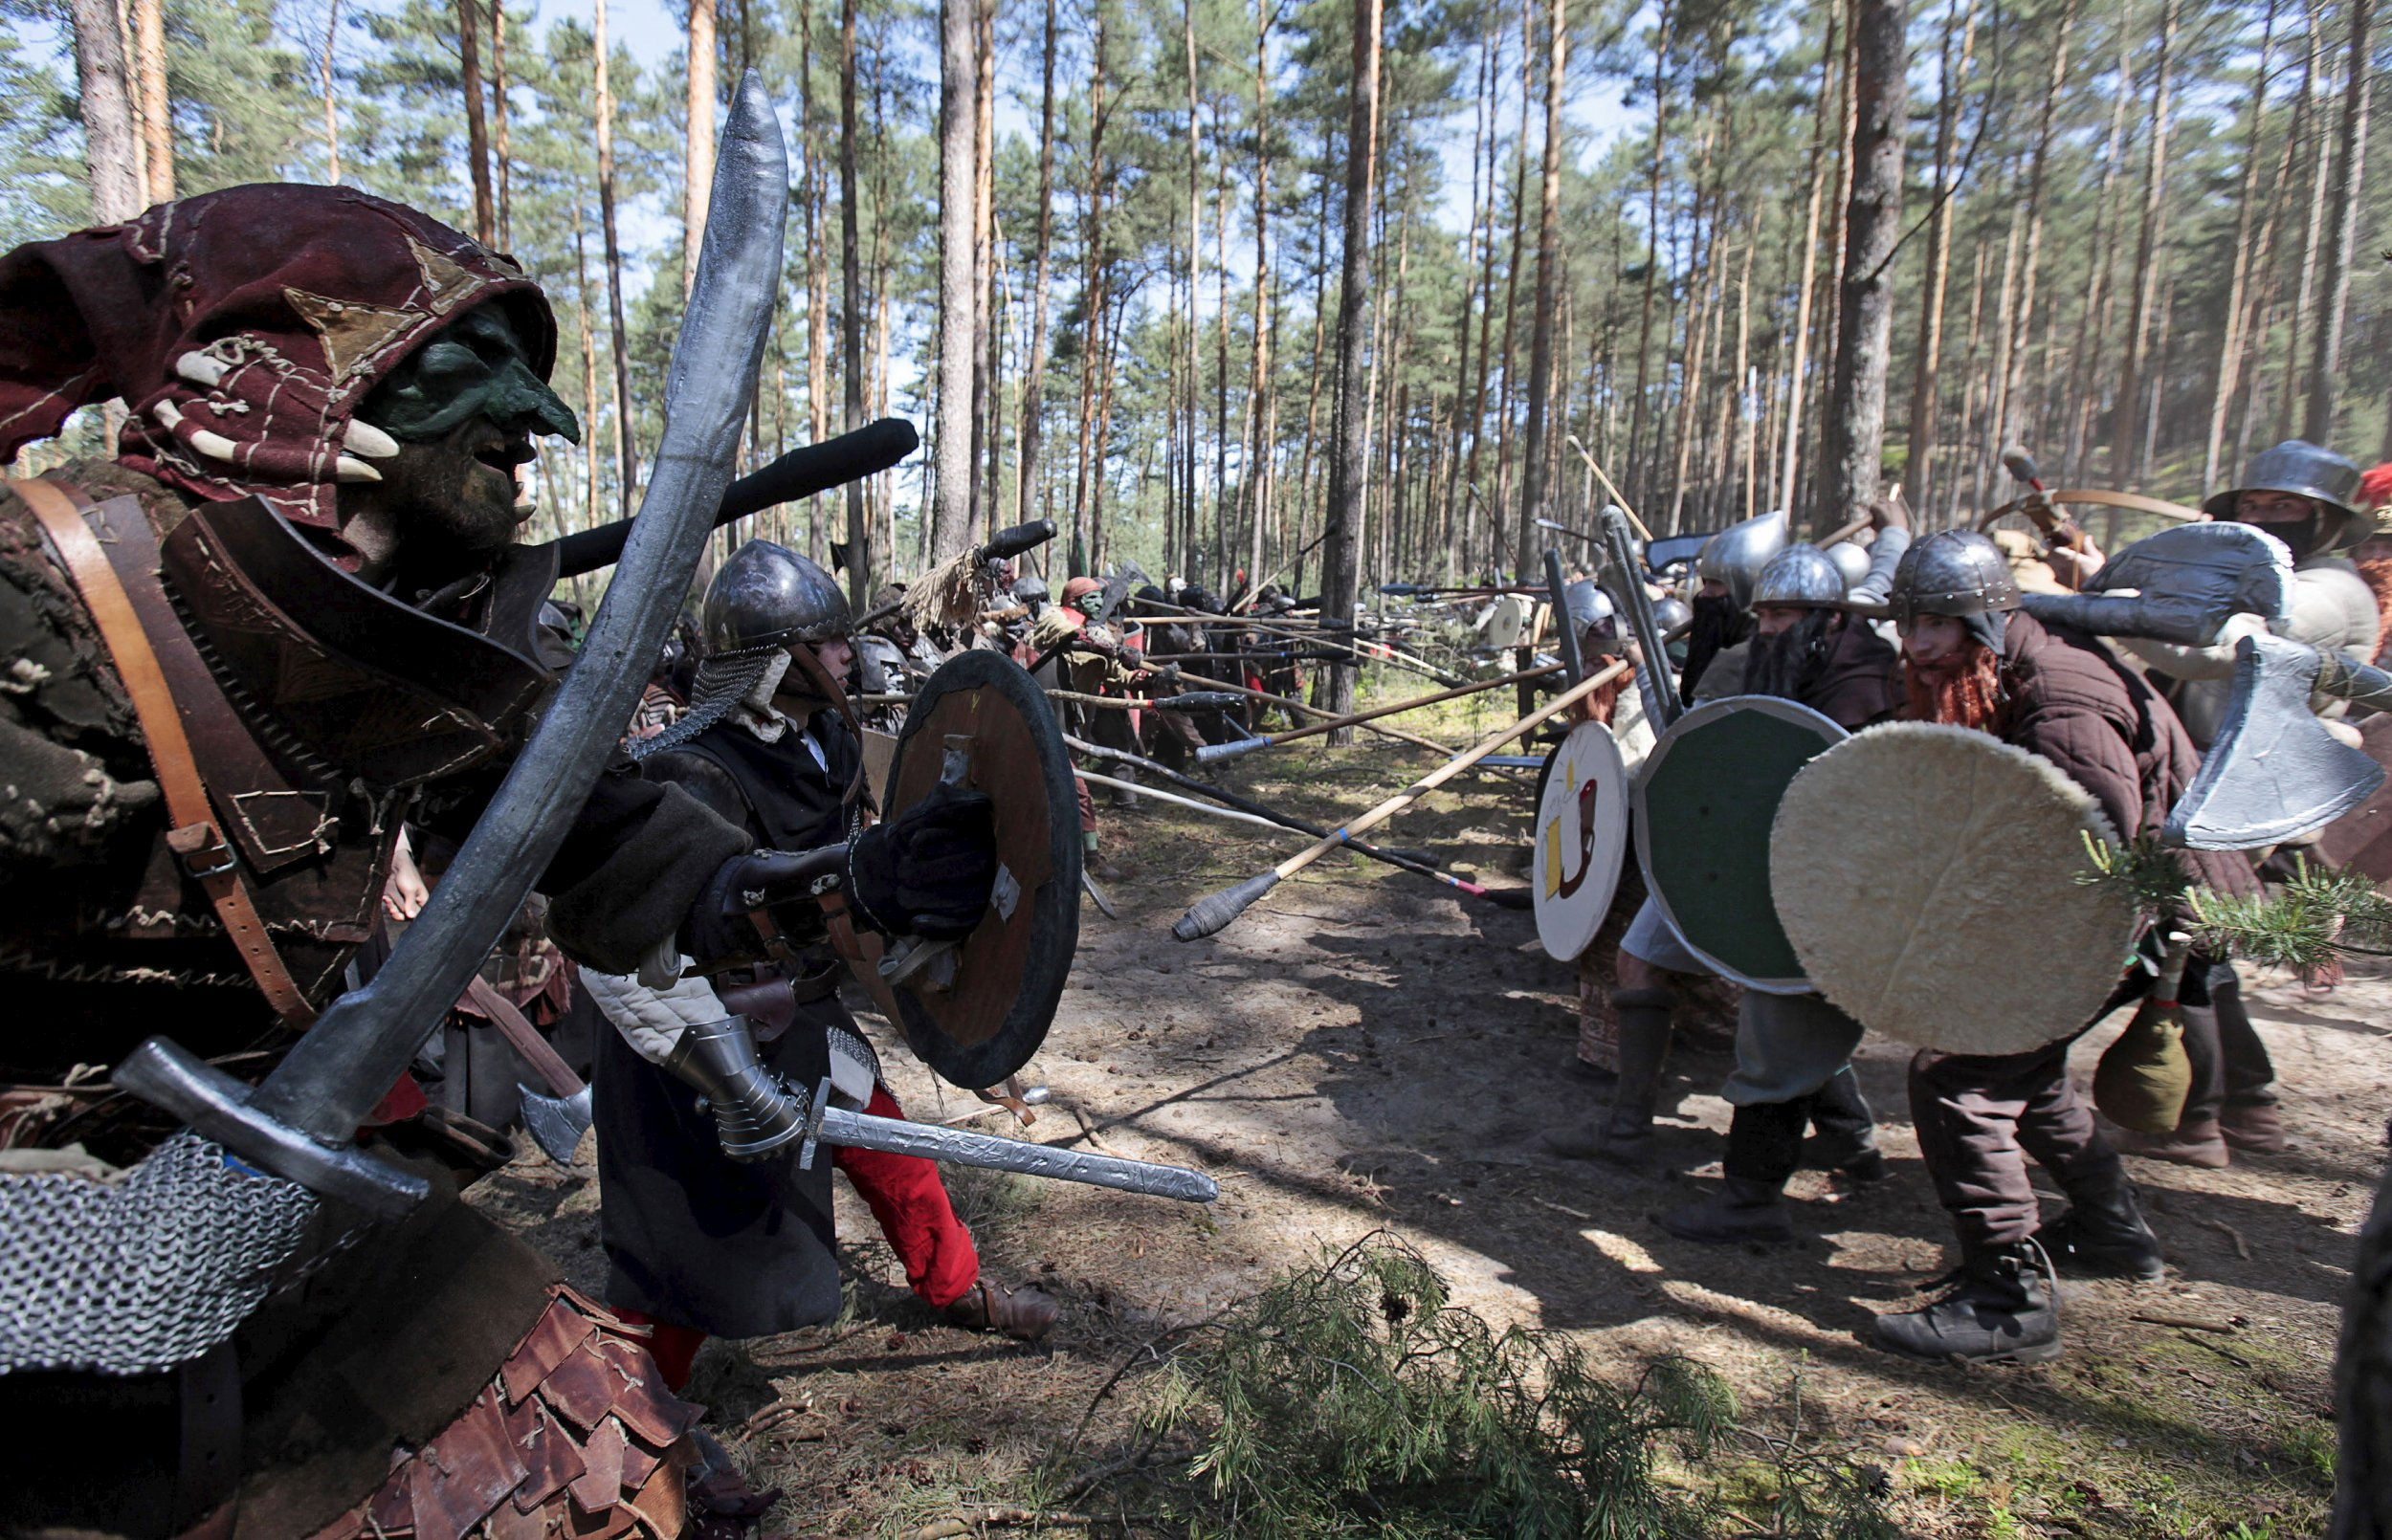 Tolkien universe re-enactors clash in a forest